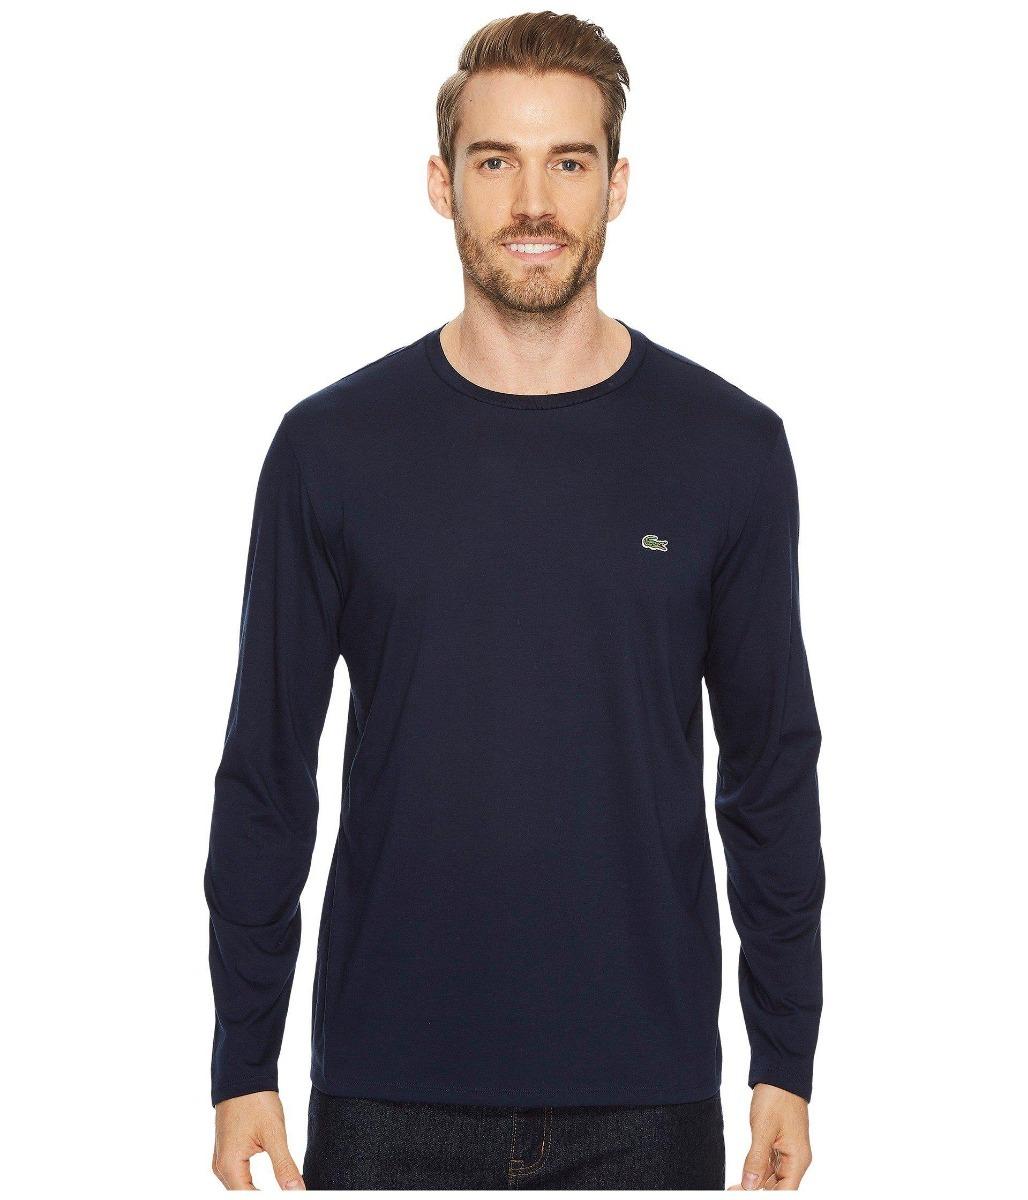 8cec5cd6ca lacoste camiseta tamanho m masculina manga longa. Carregando zoom.